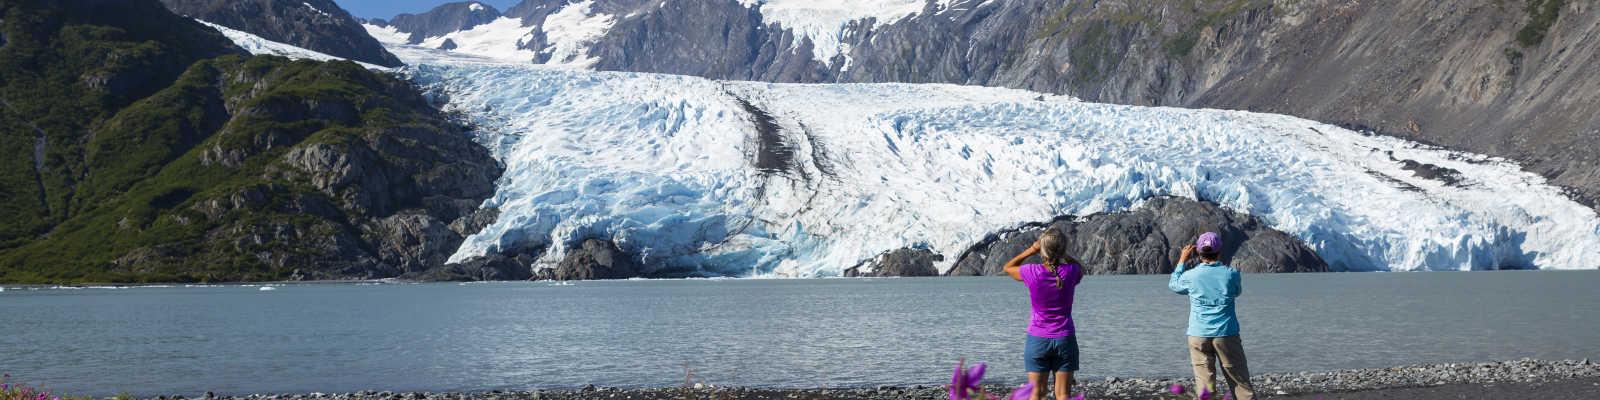 Portage Glacier view for Anchorage hikers